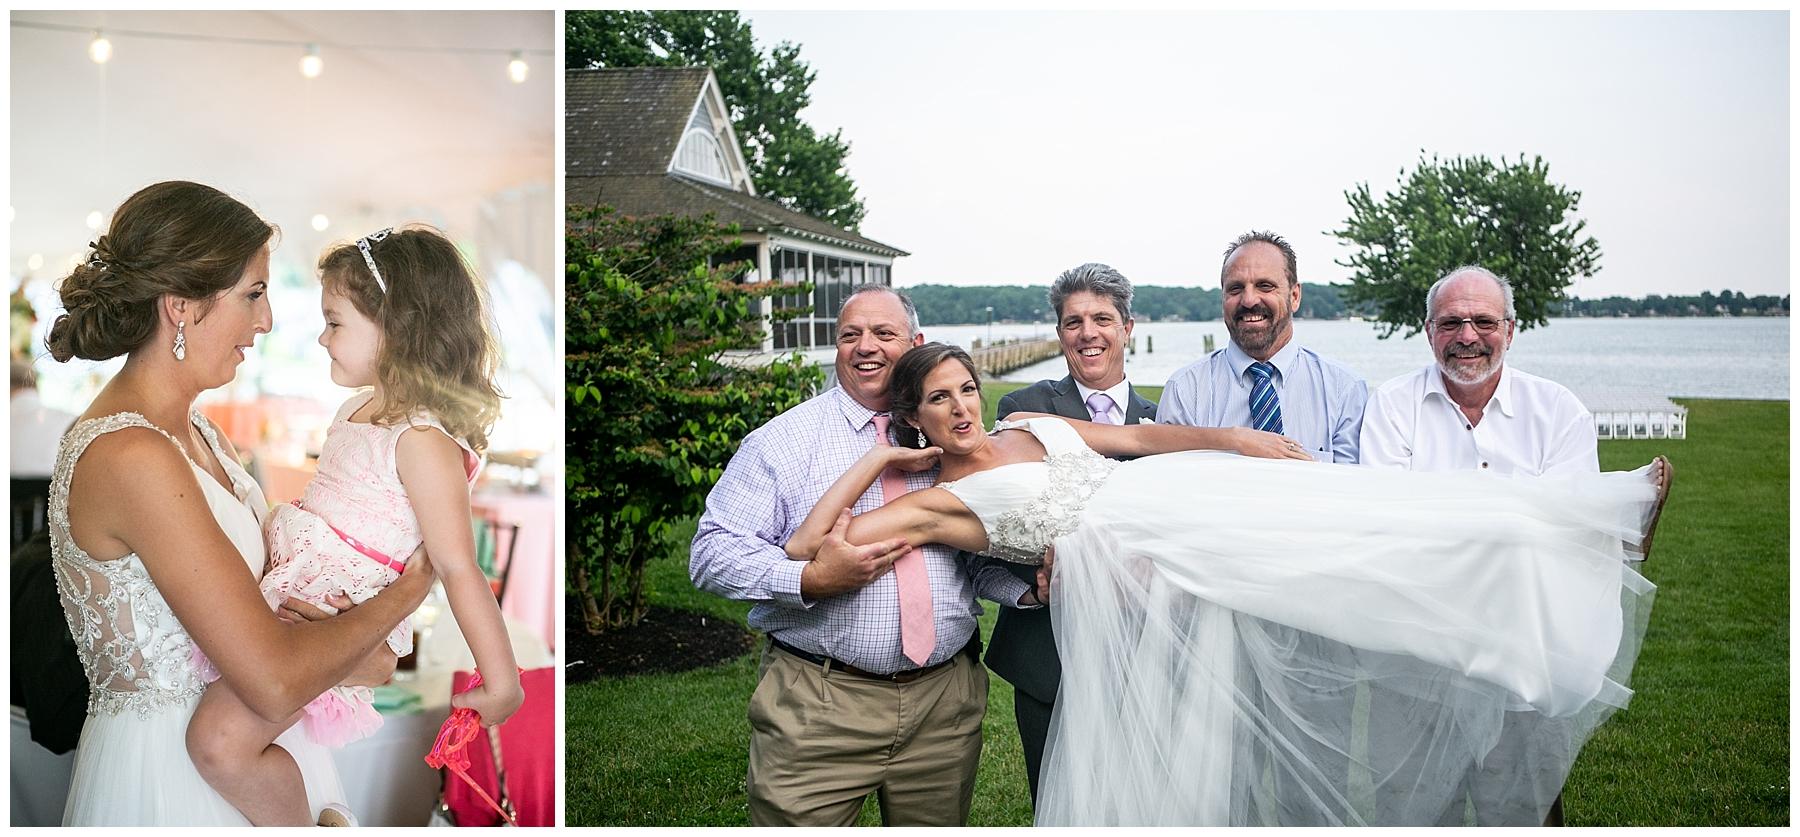 Chelsea Phil Bohemia River Overlook Wedding Living Radiant Photography photos_0162.jpg